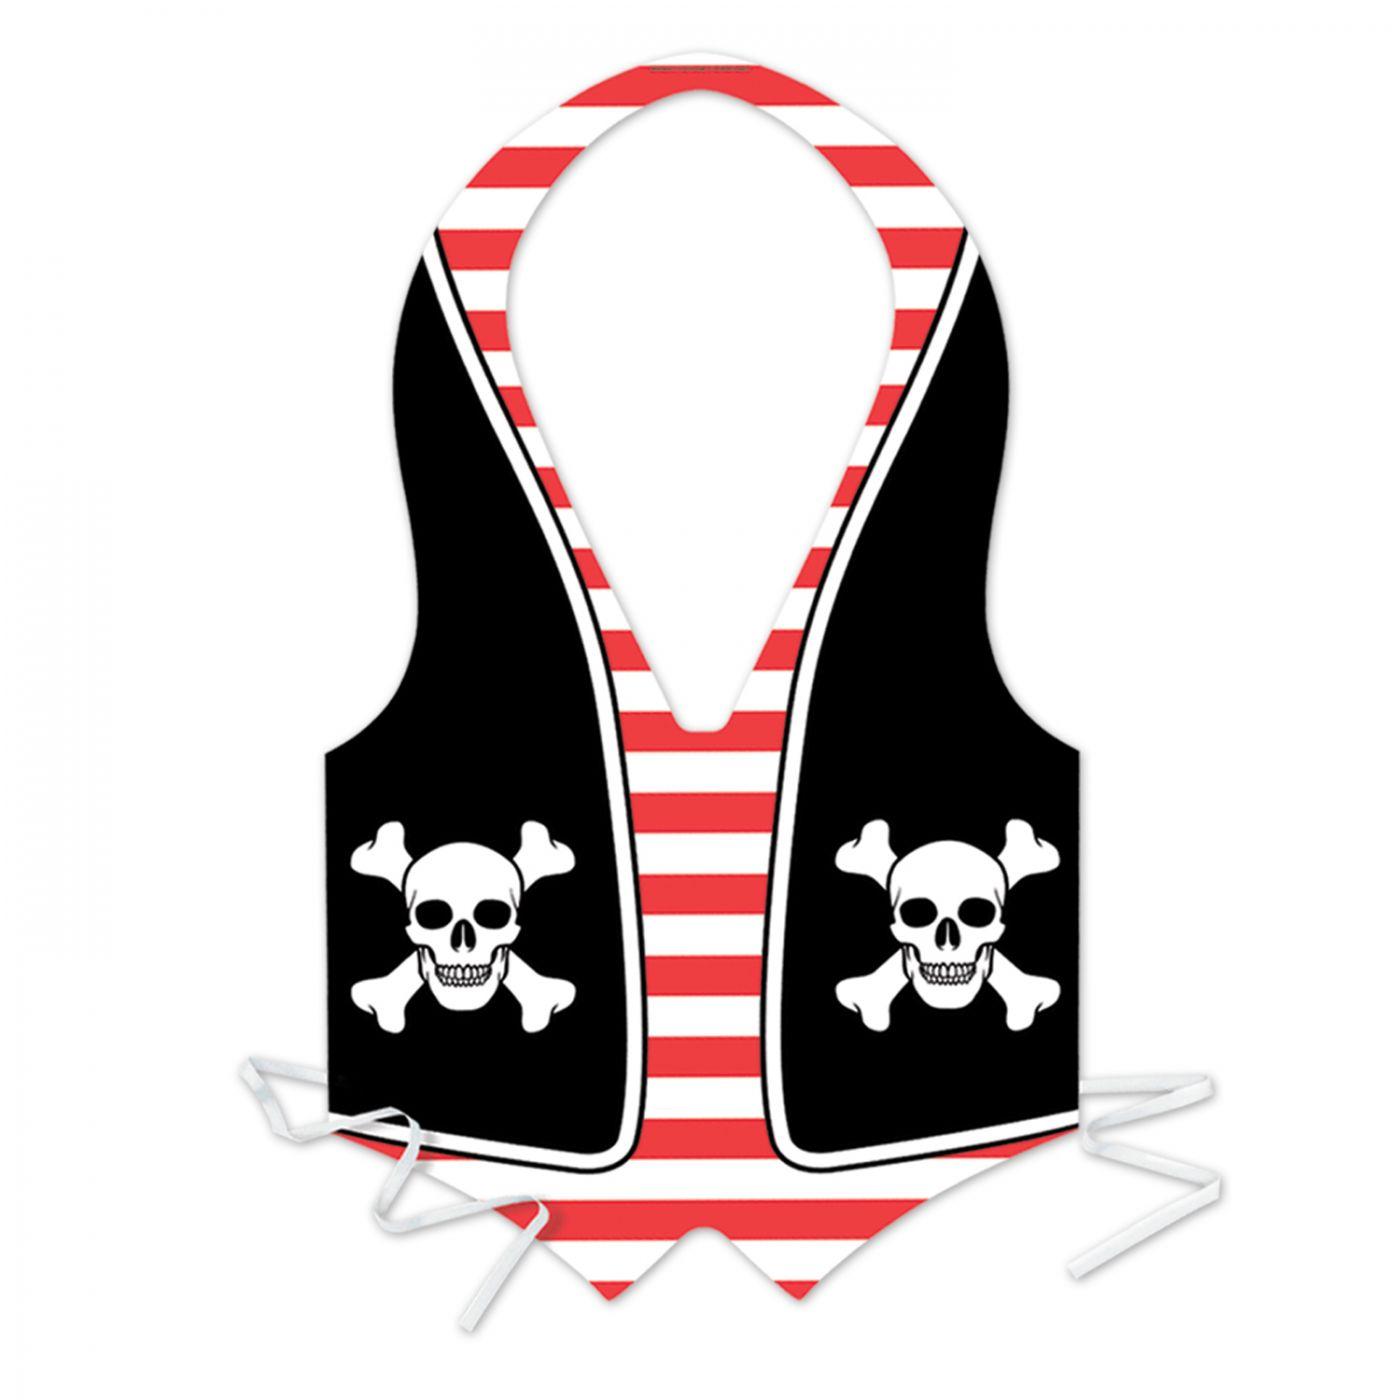 Pkgd Plastic Pirate Vest (24) image